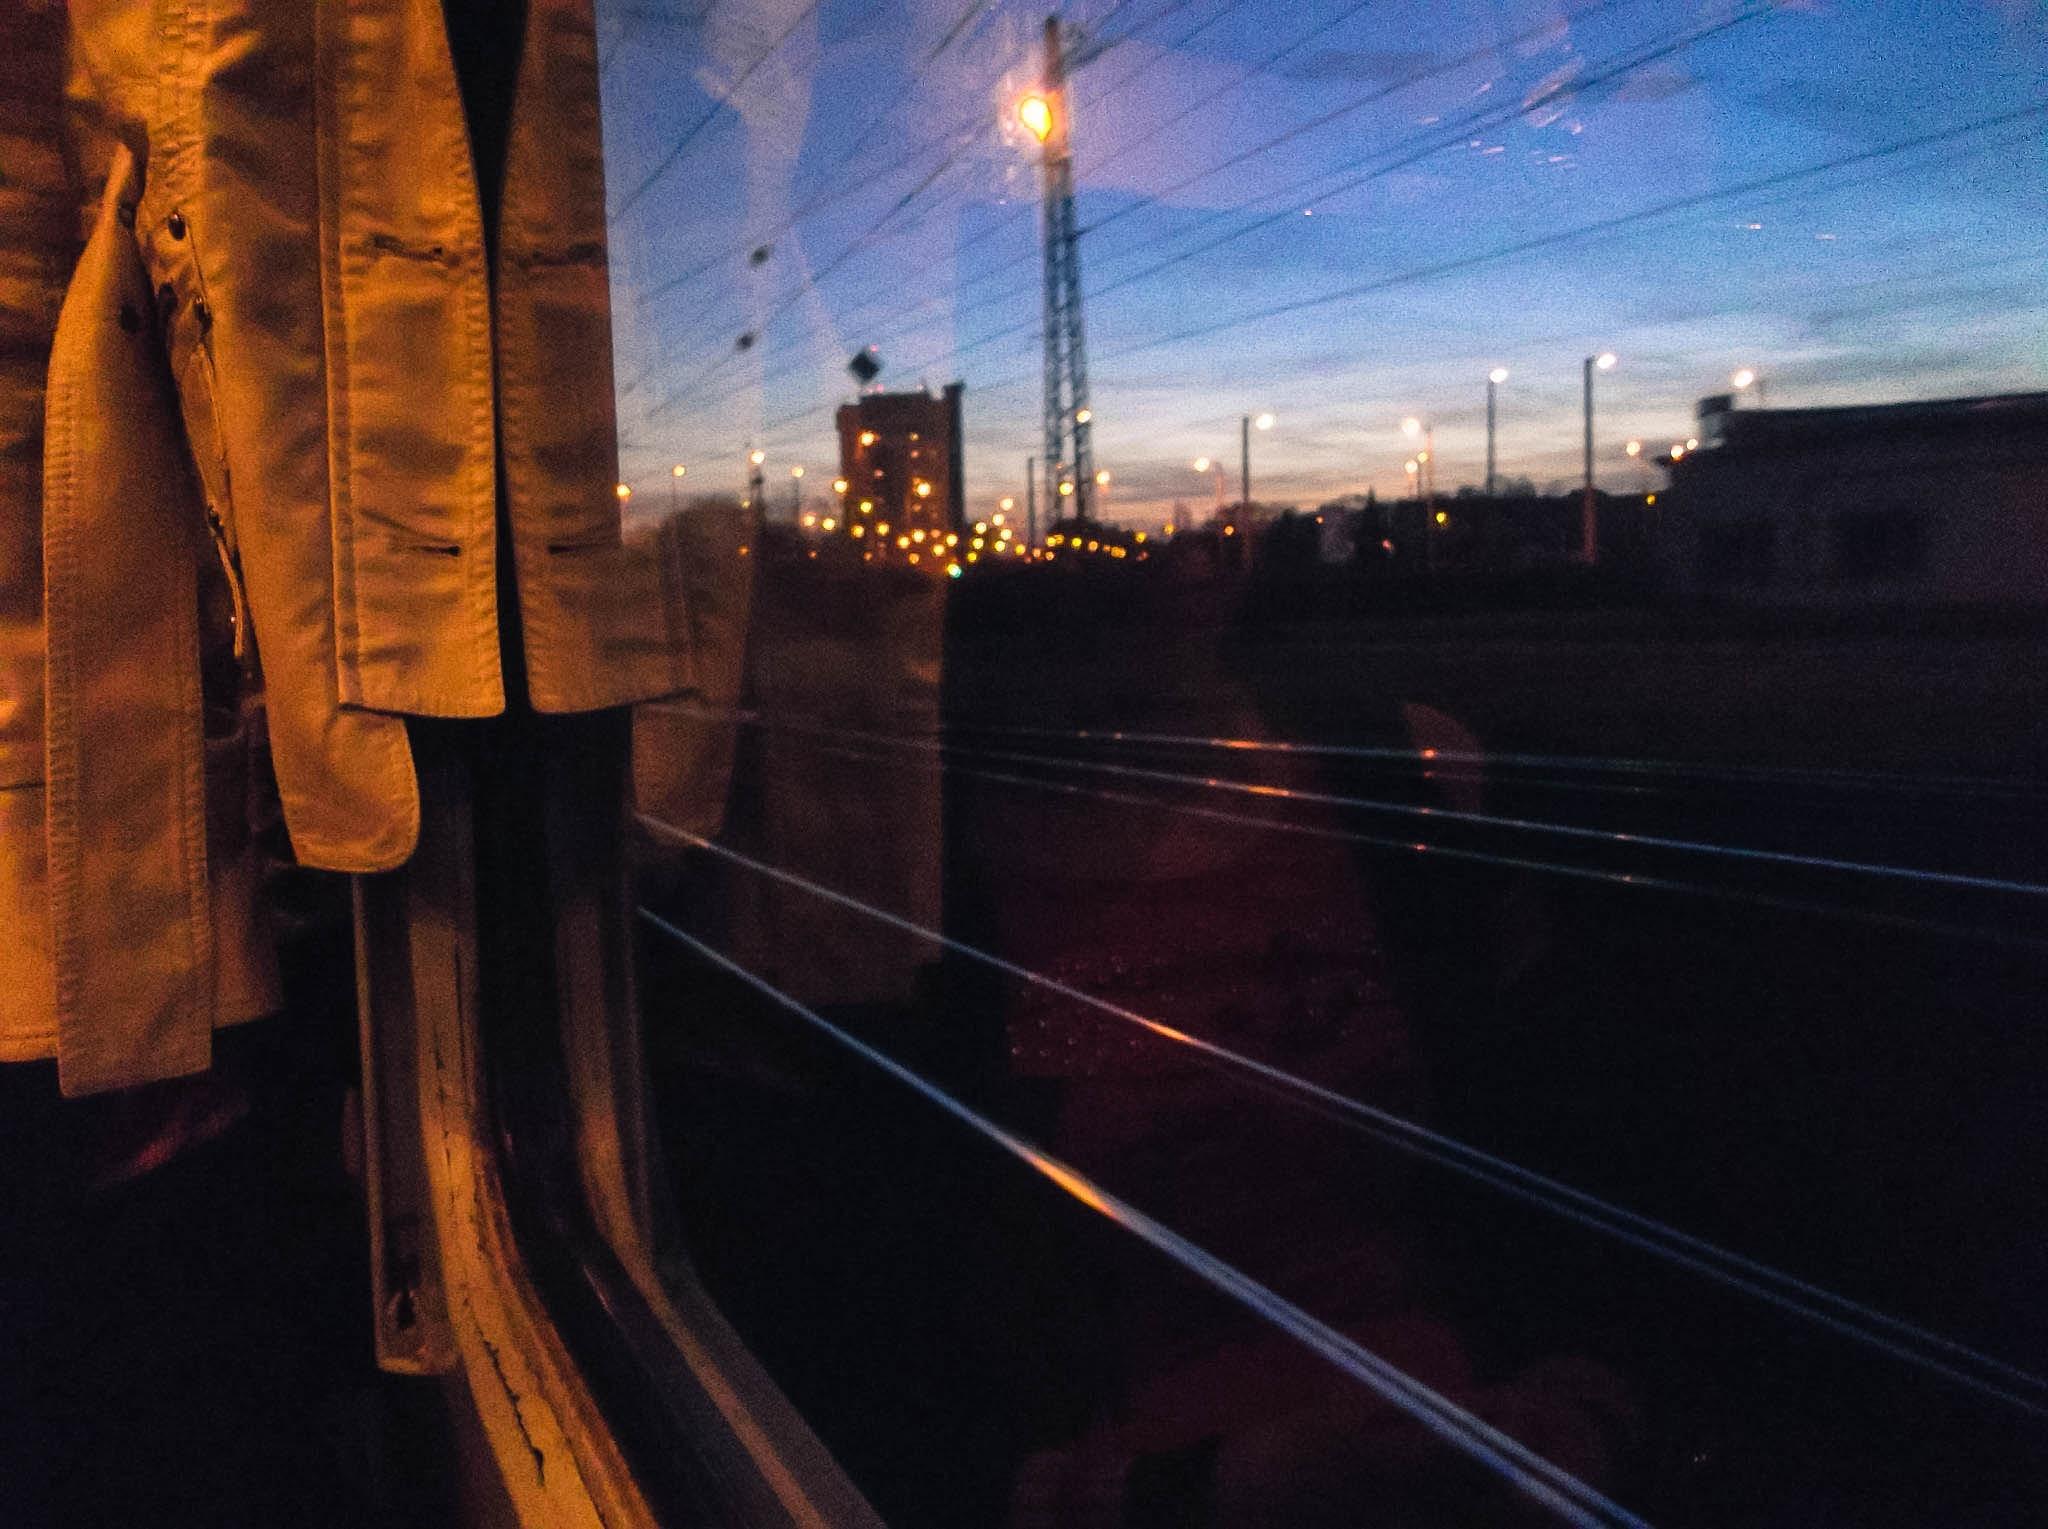 Night train by Balazs Kosaras